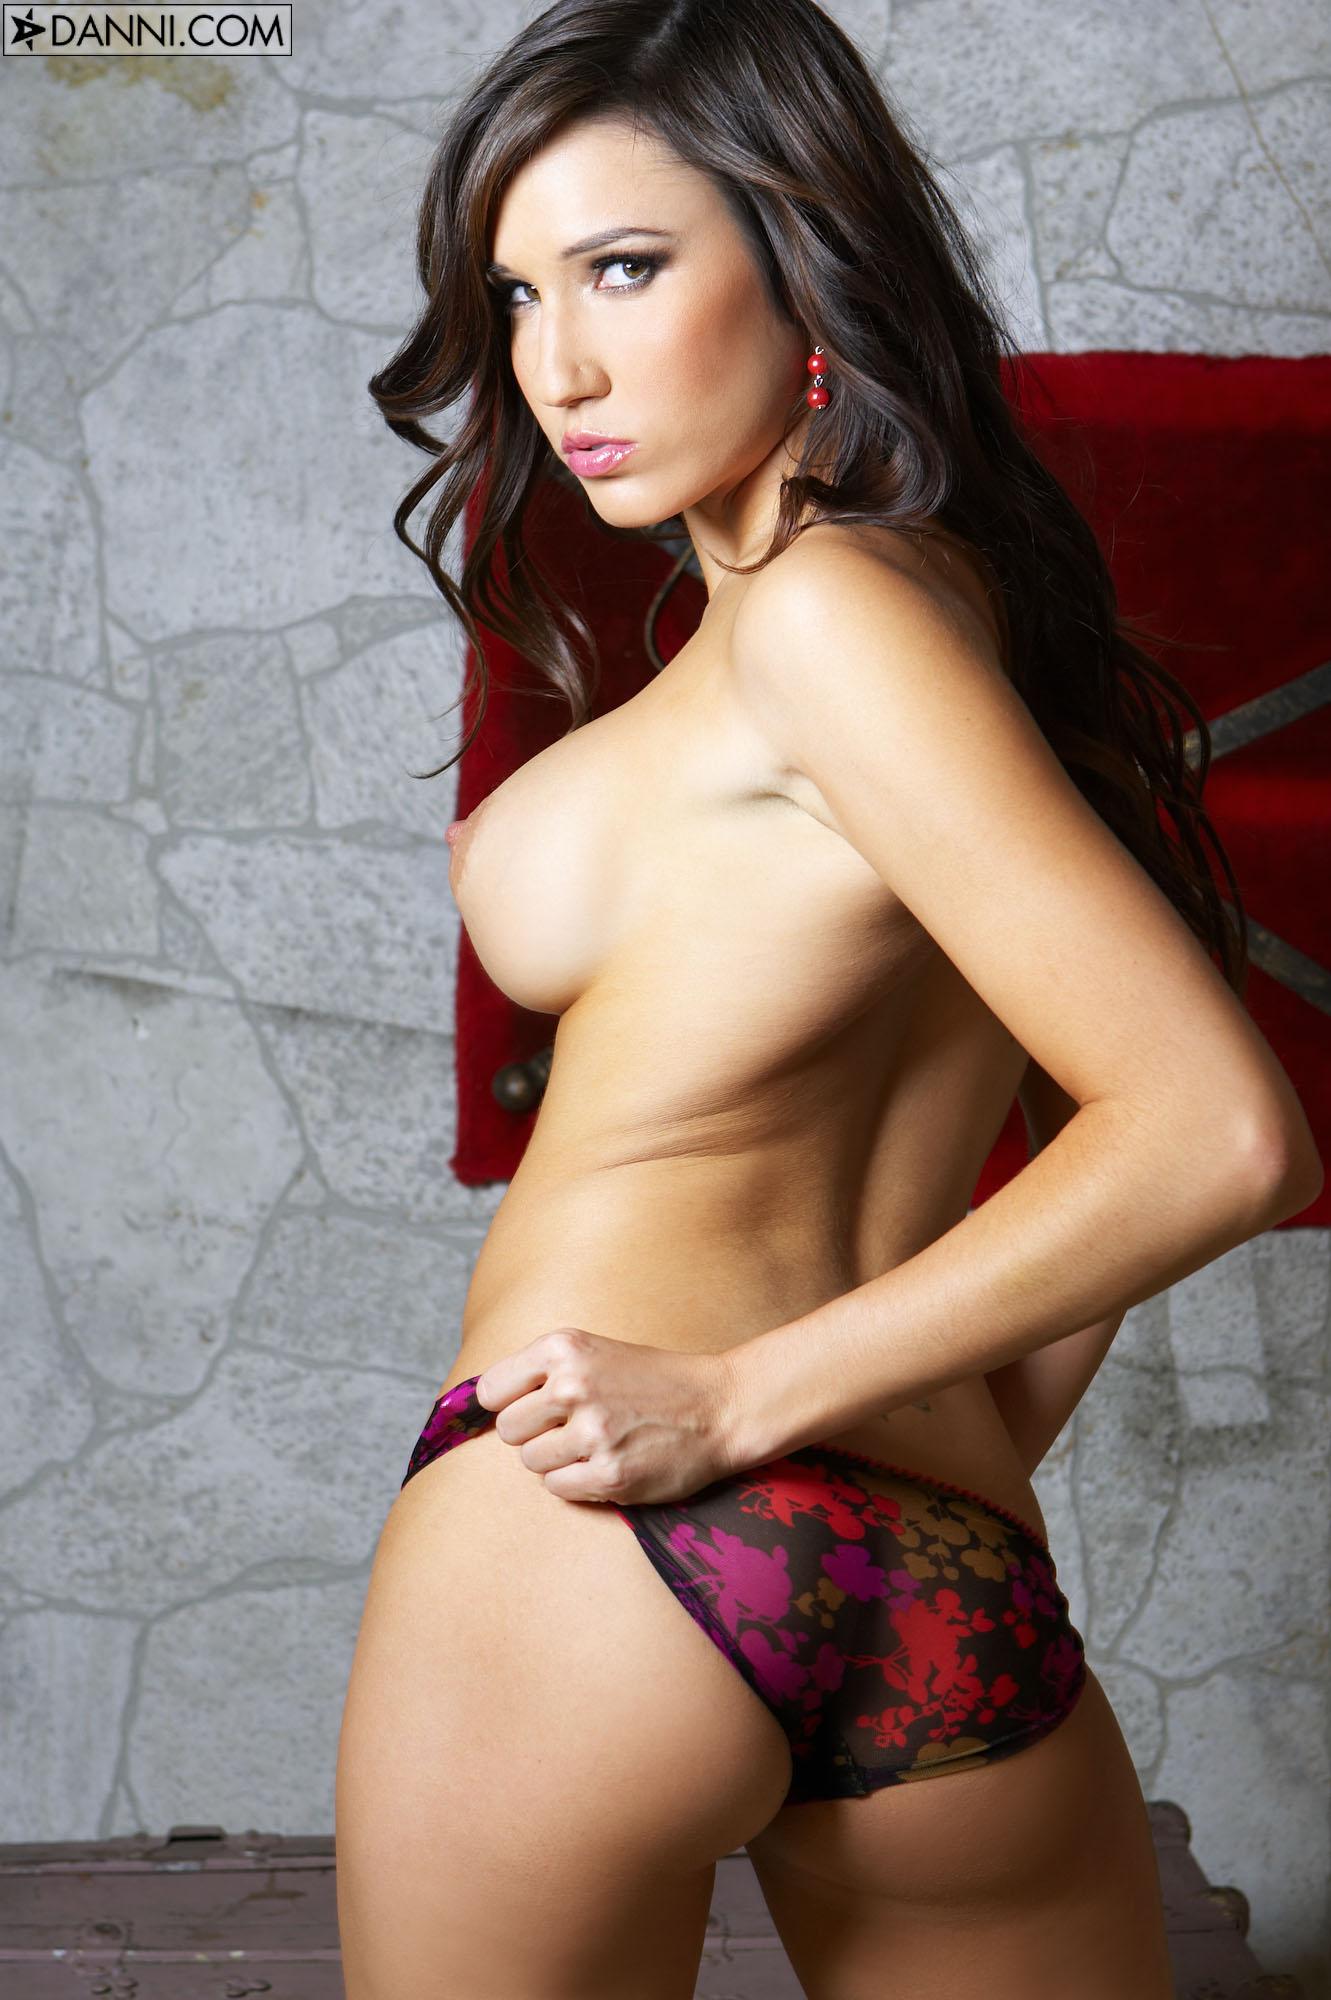 Erin Avery Gallery > Sexy Beauties